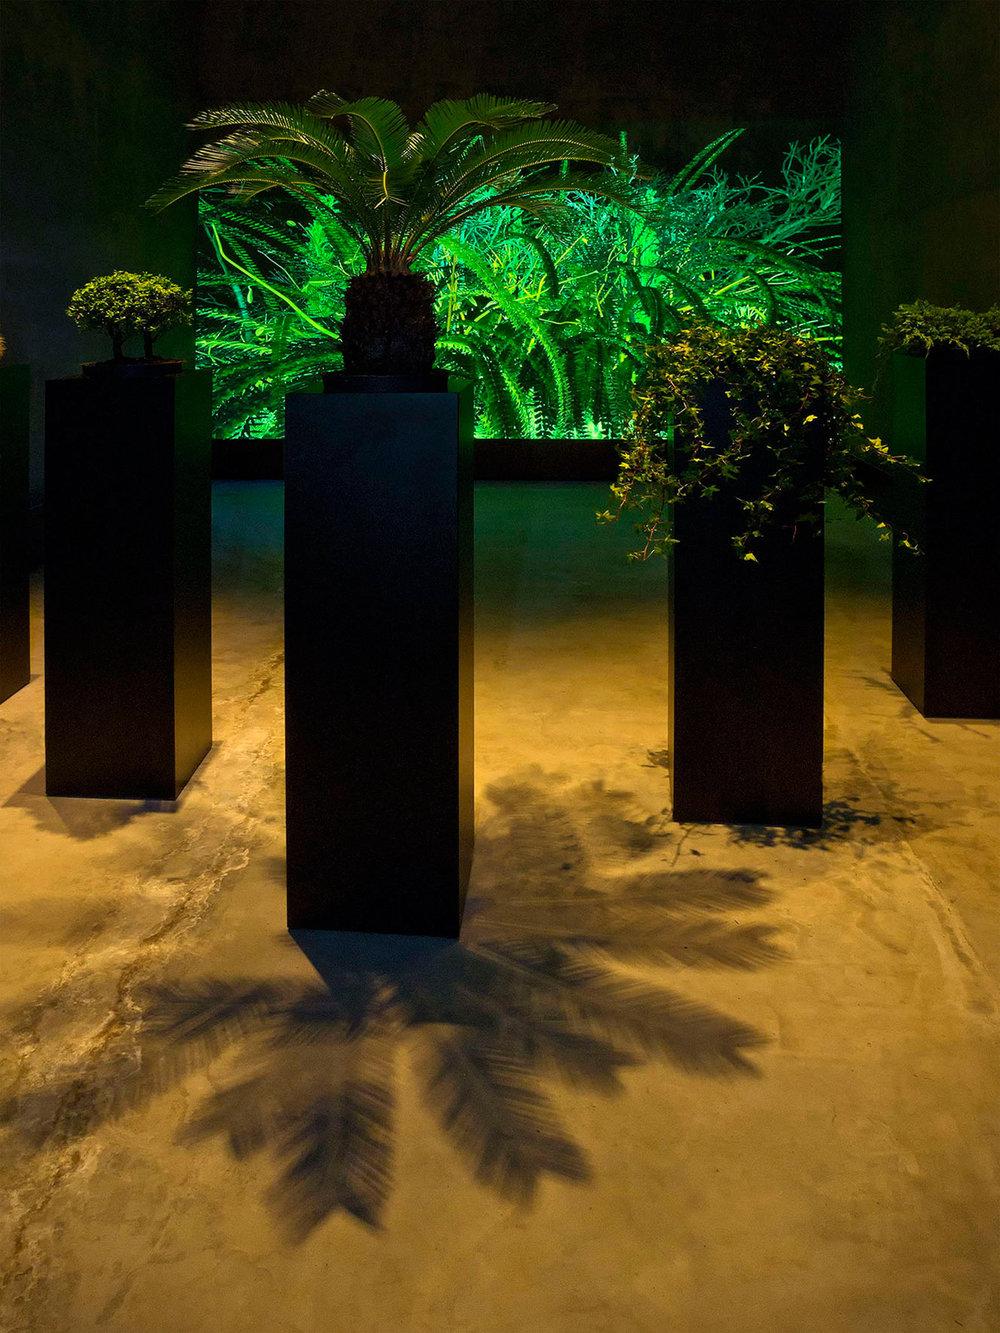 Sommerer-Mignonneau-Interactive-Plant-Growing-1992-1-web.jpg